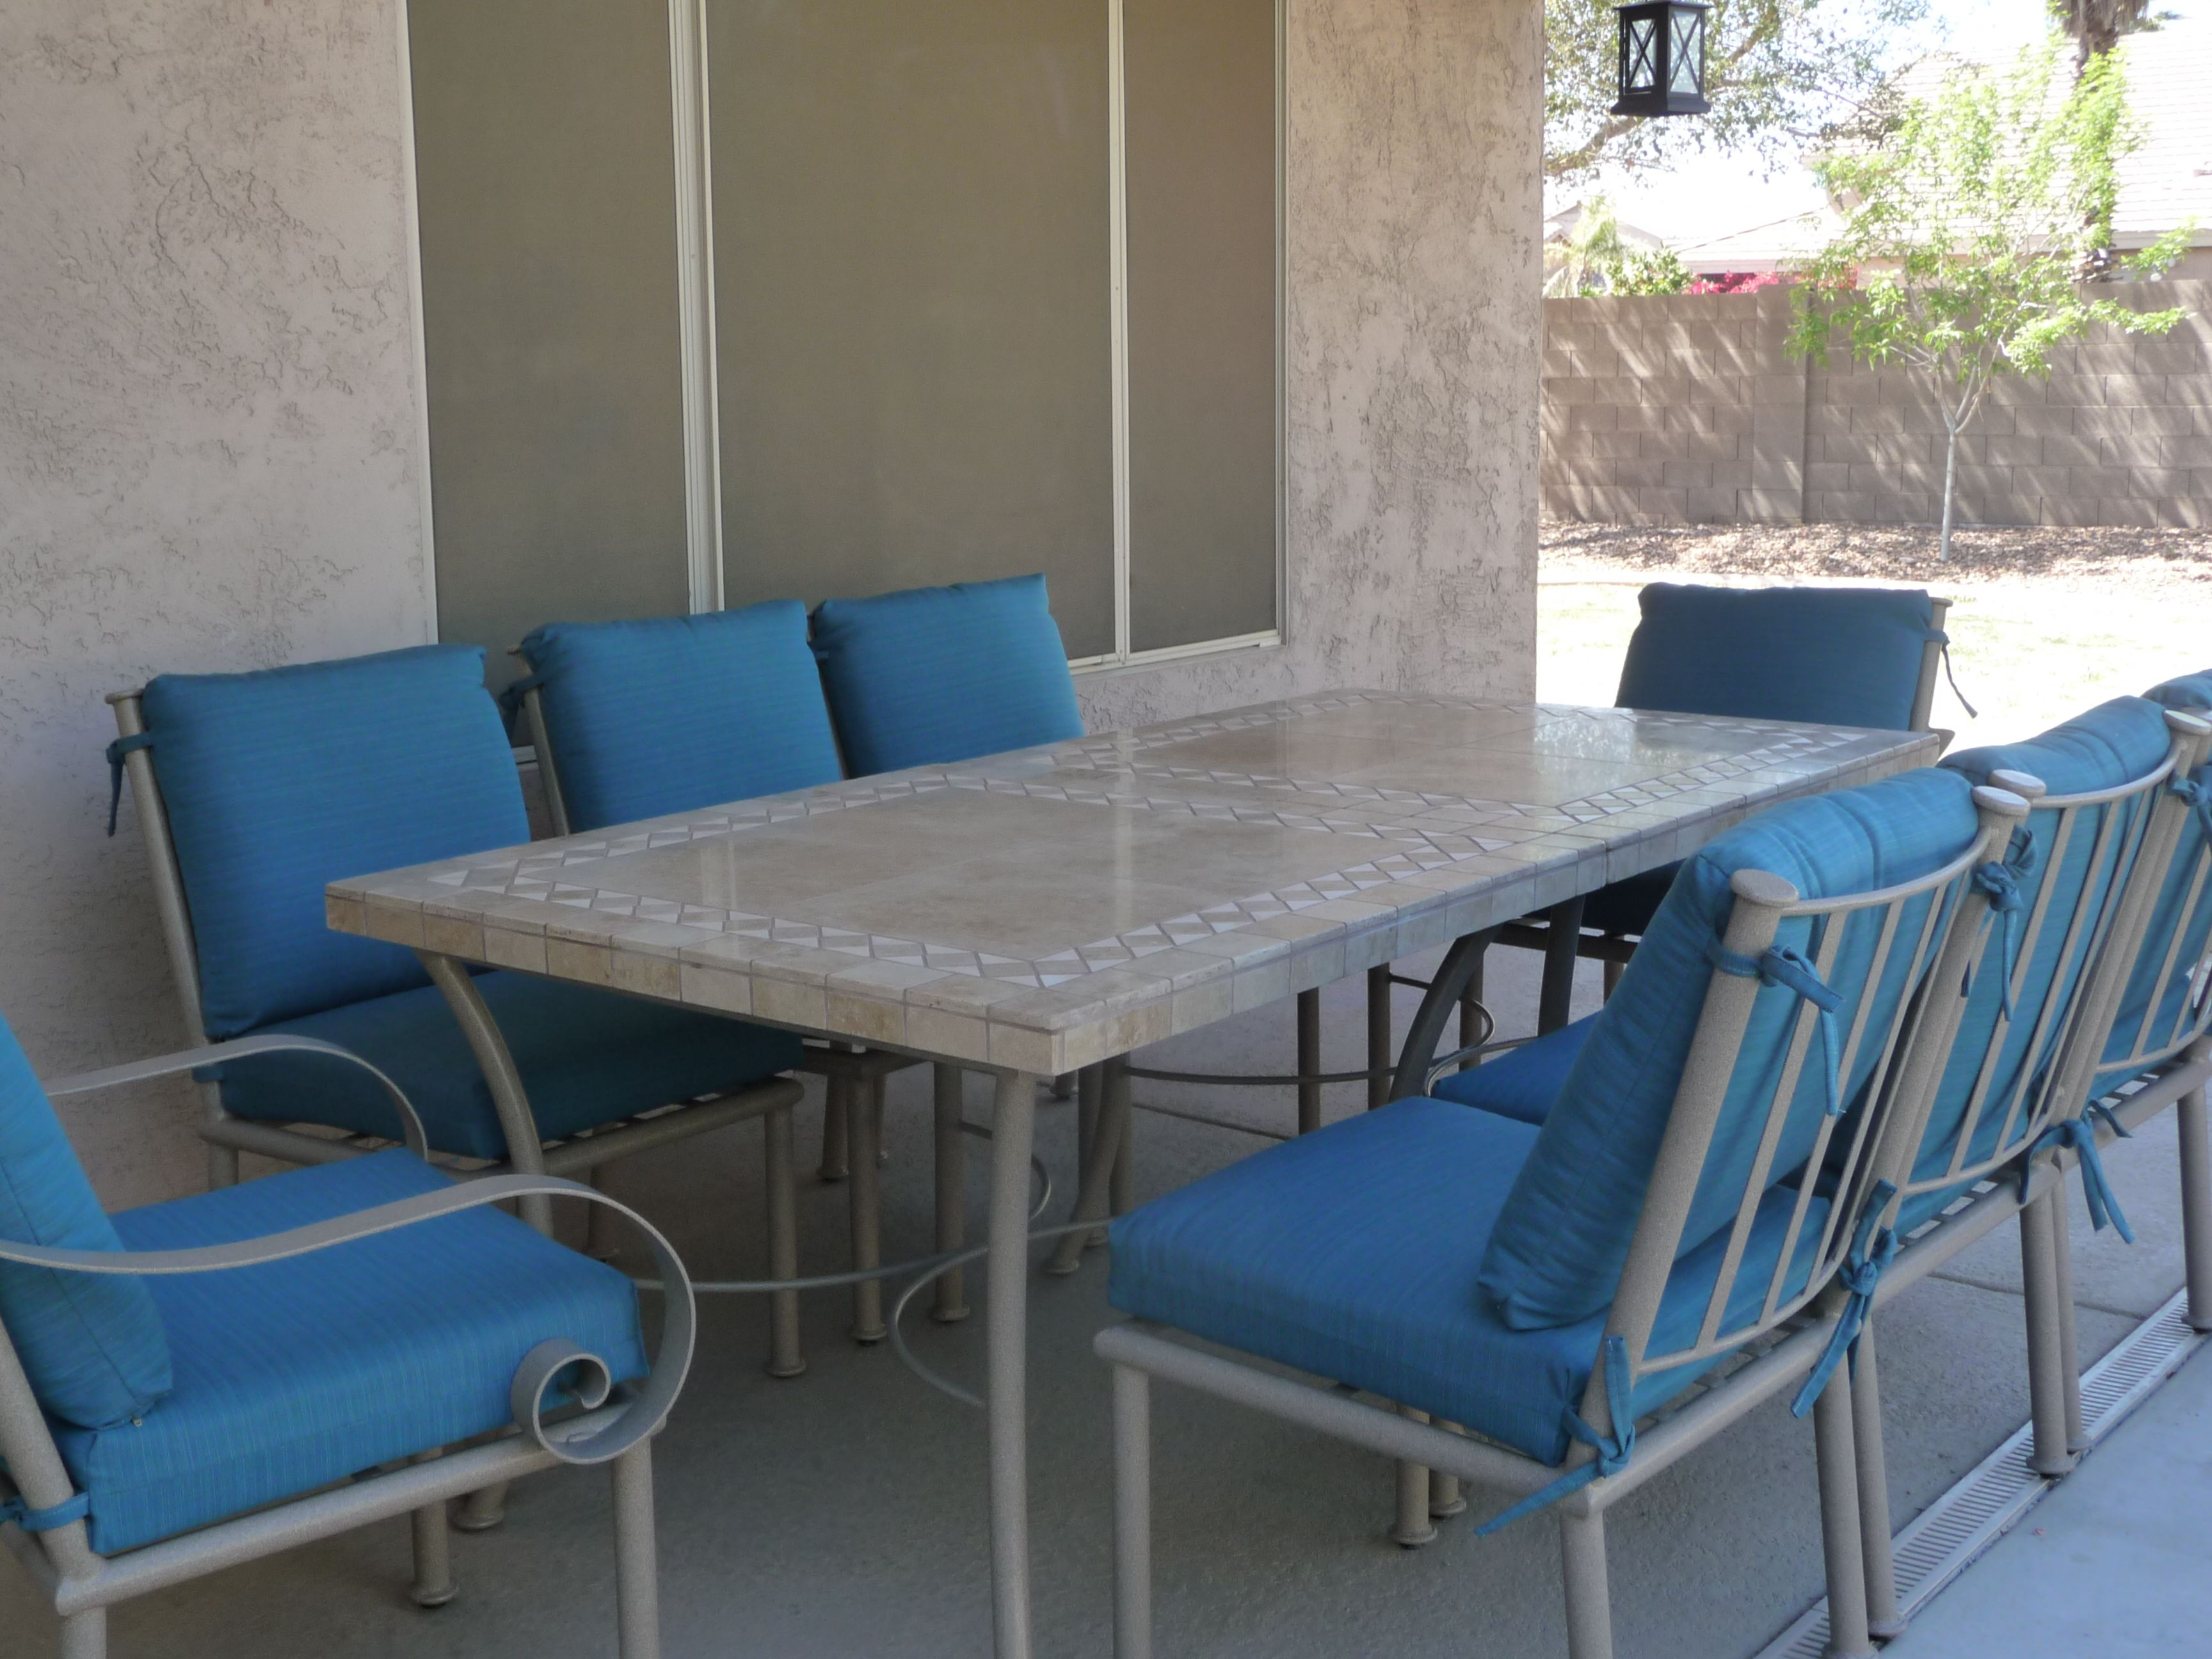 discount full area size frys furniturenix arizona stores furniture patio in inspirations images comfy bestnixpatio phoenix of